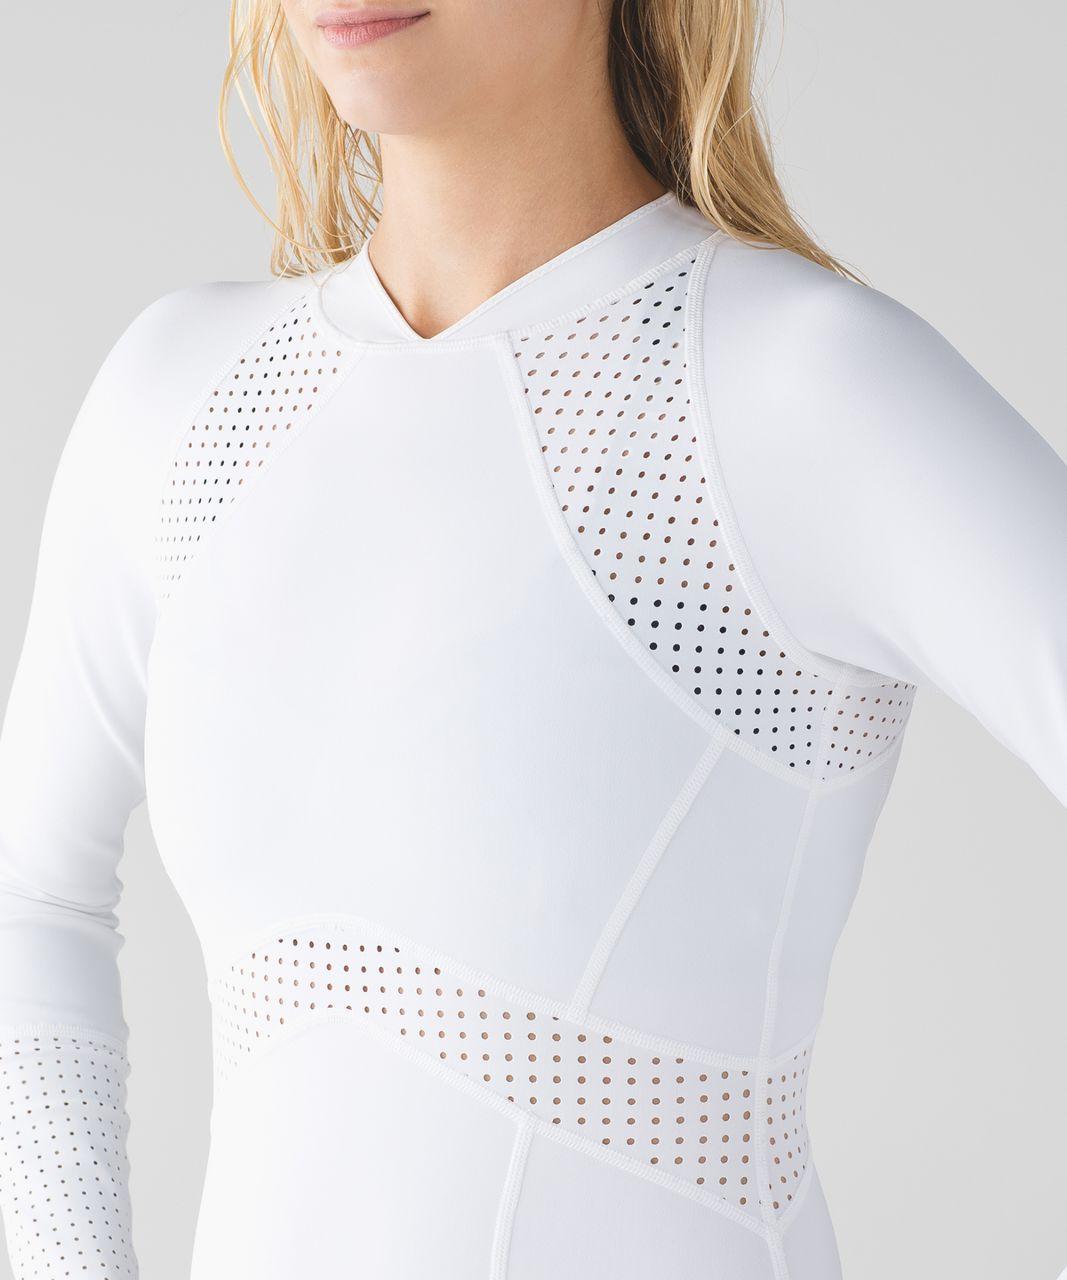 Lululemon Tidal Flow Paddle Suit - White